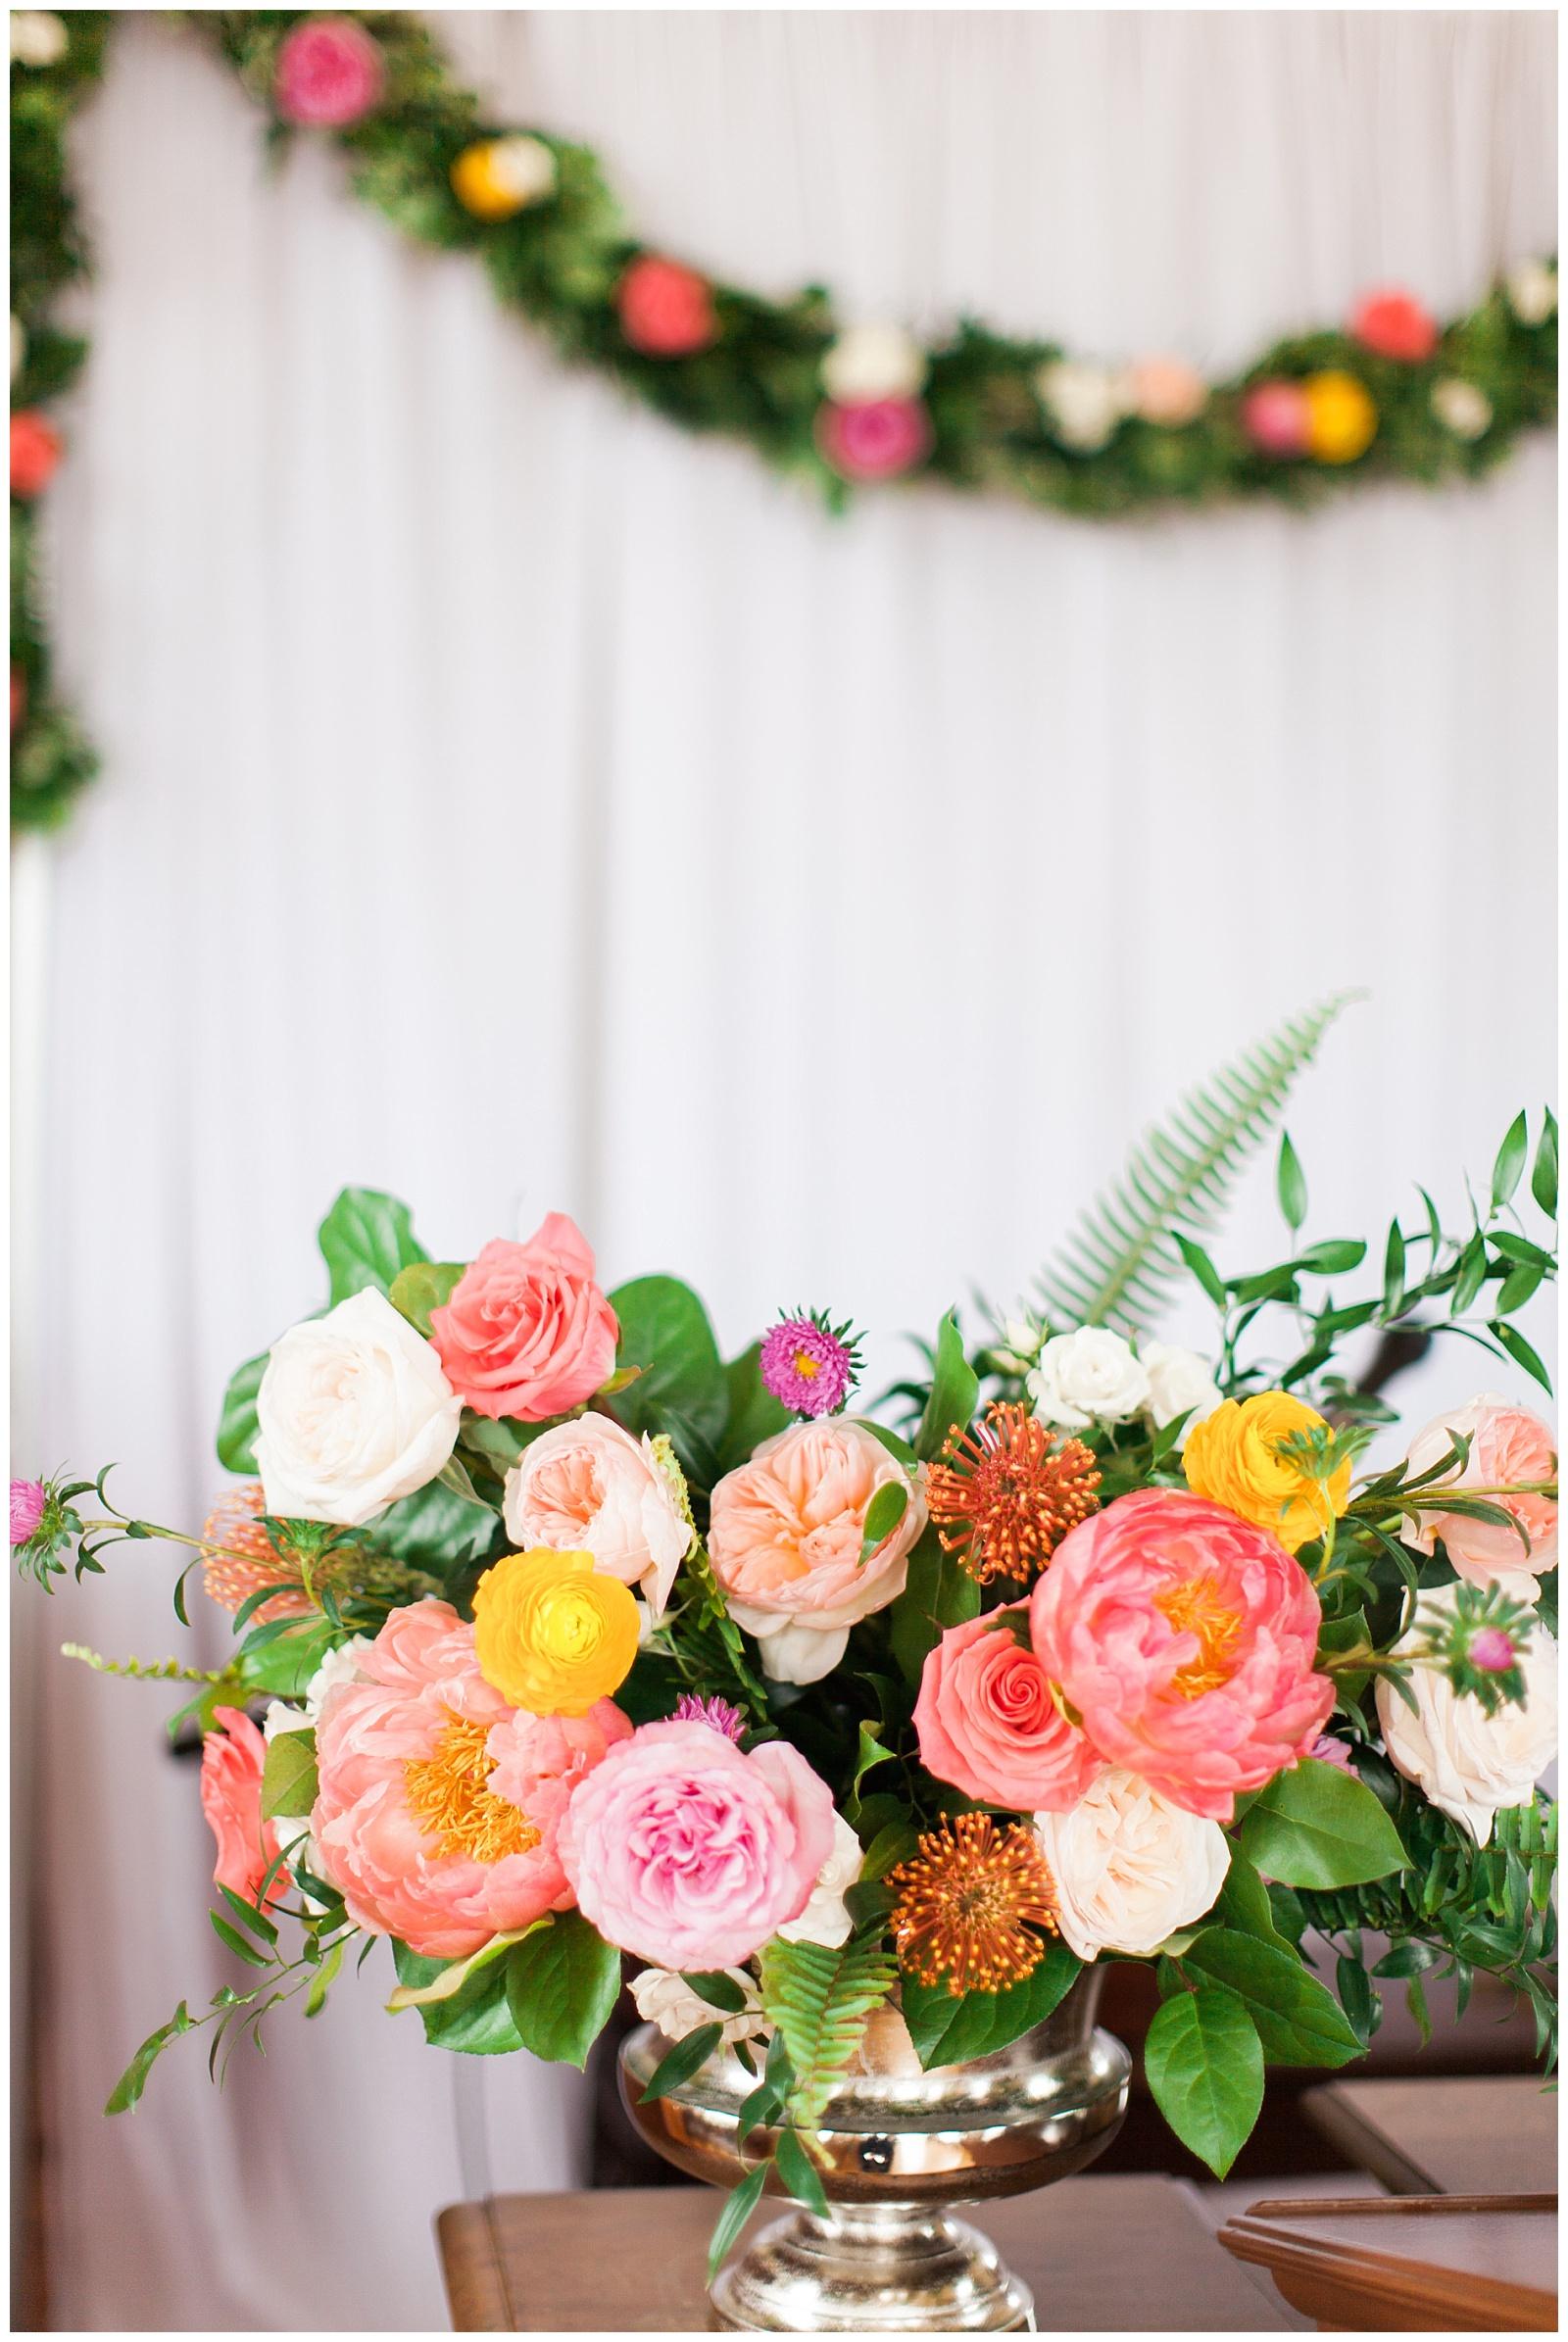 Centerpiece flowers for reception at Guelph Ontario Wedding | Ontario Wedding Photographer | Toronto Wedding Photographer | 3photography